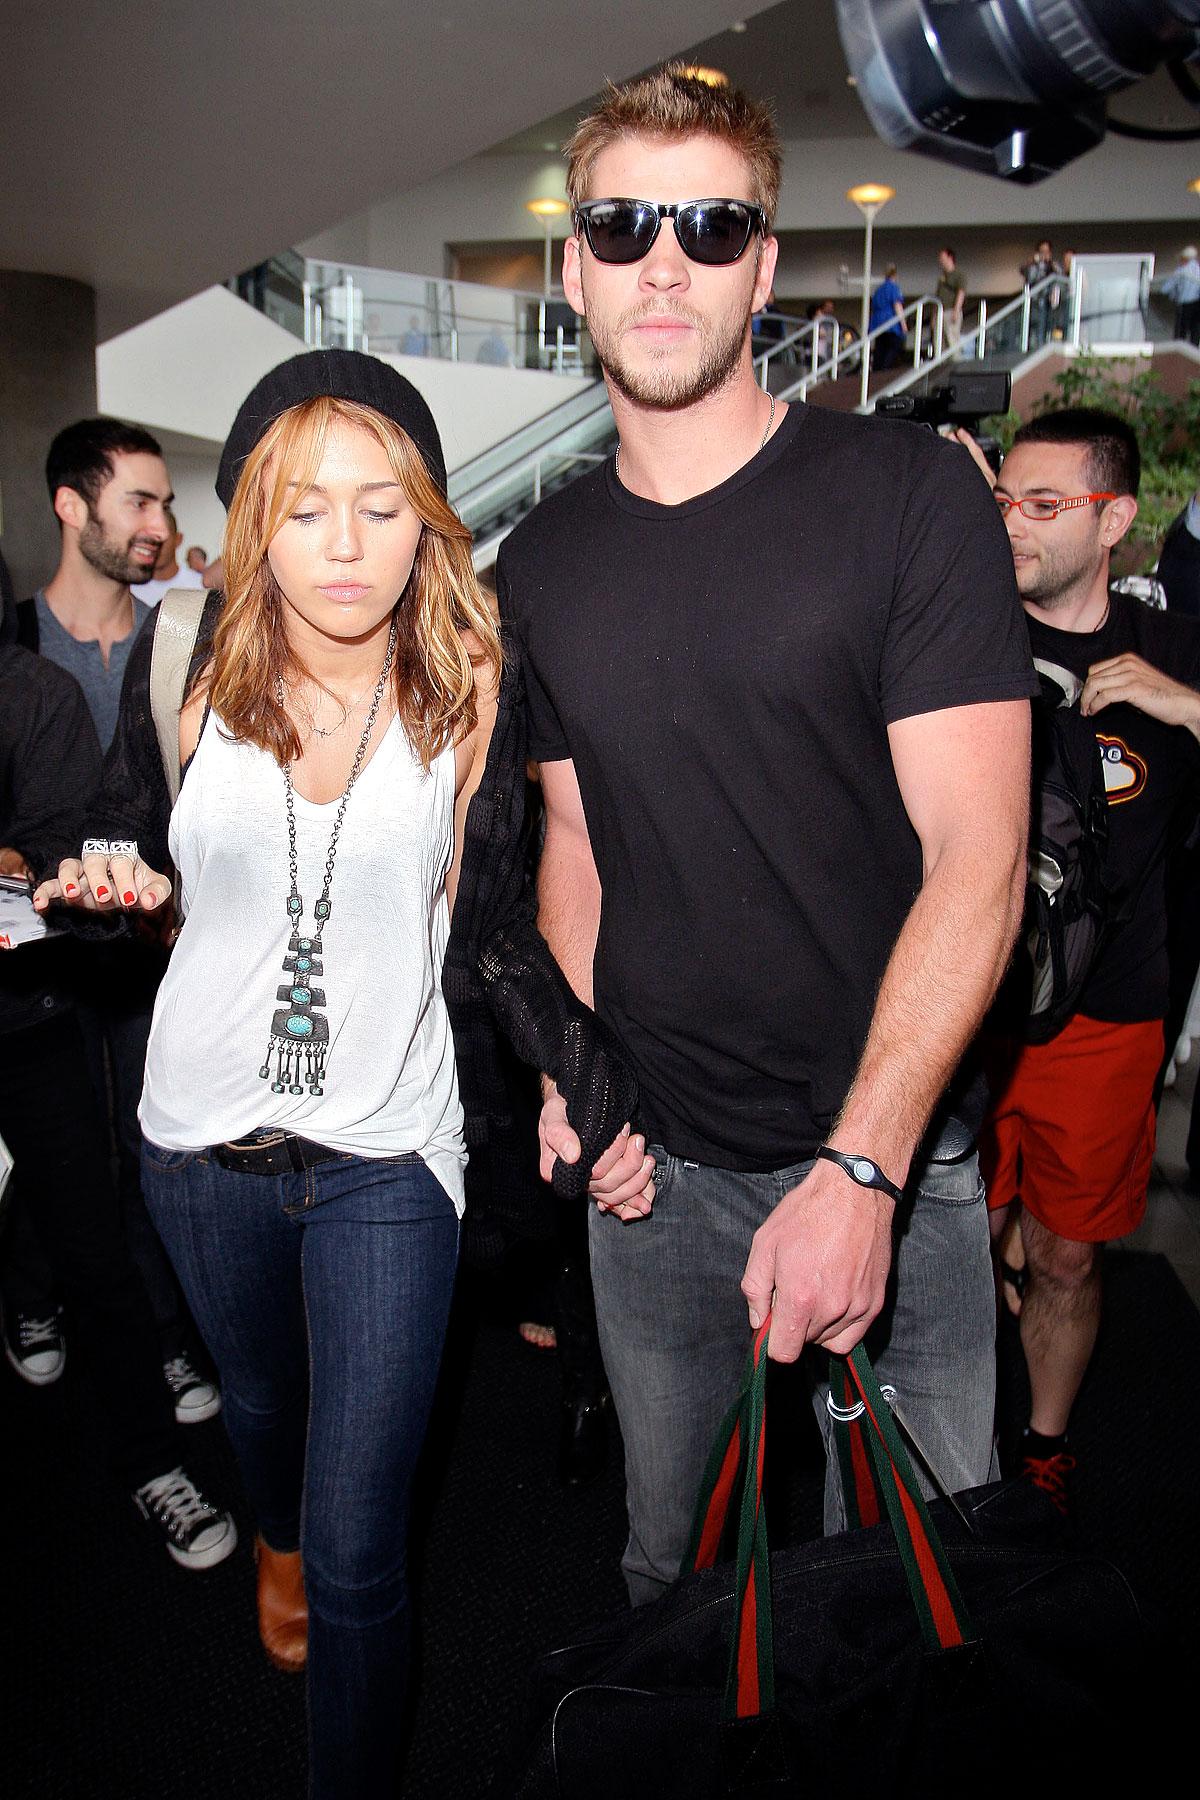 Miley Cyrus & Liam Hemsworth Leave Canada (PHOTOS)